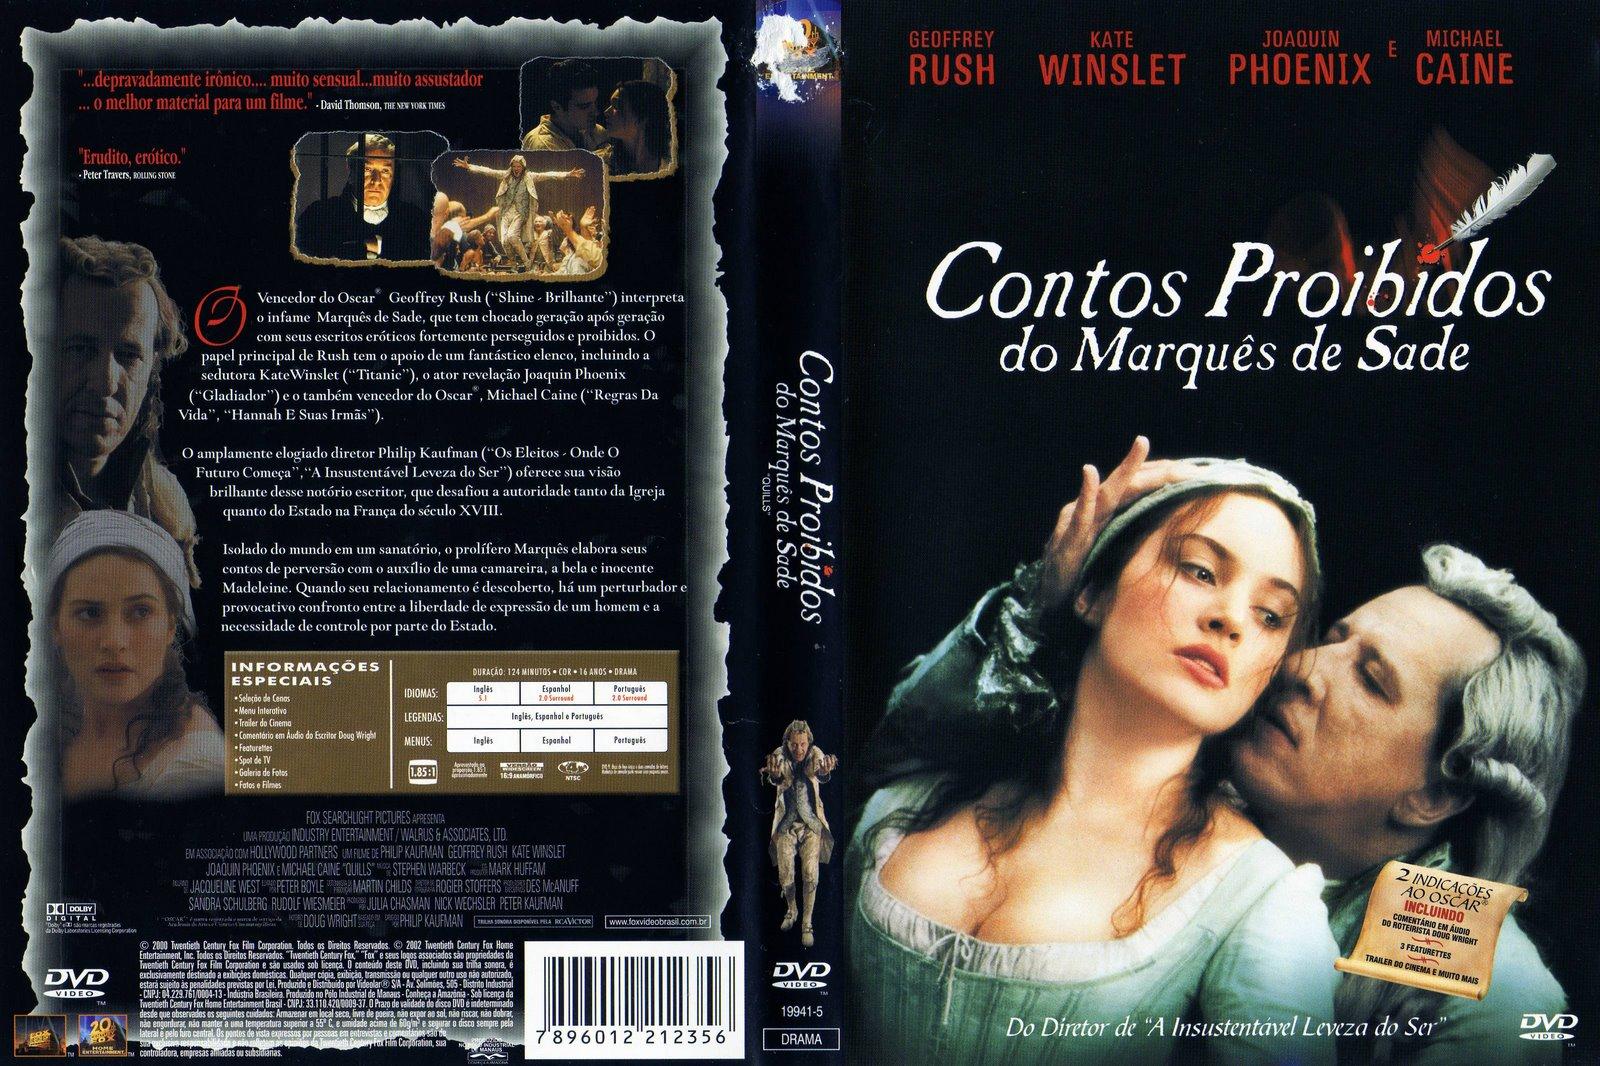 http://3.bp.blogspot.com/_GqpLe7EsmXI/S7ChlDtAlXI/AAAAAAAAABU/2cq3Ck0mP58/s1600/Contos_Proibidos_do_Marques_Sade.jpg